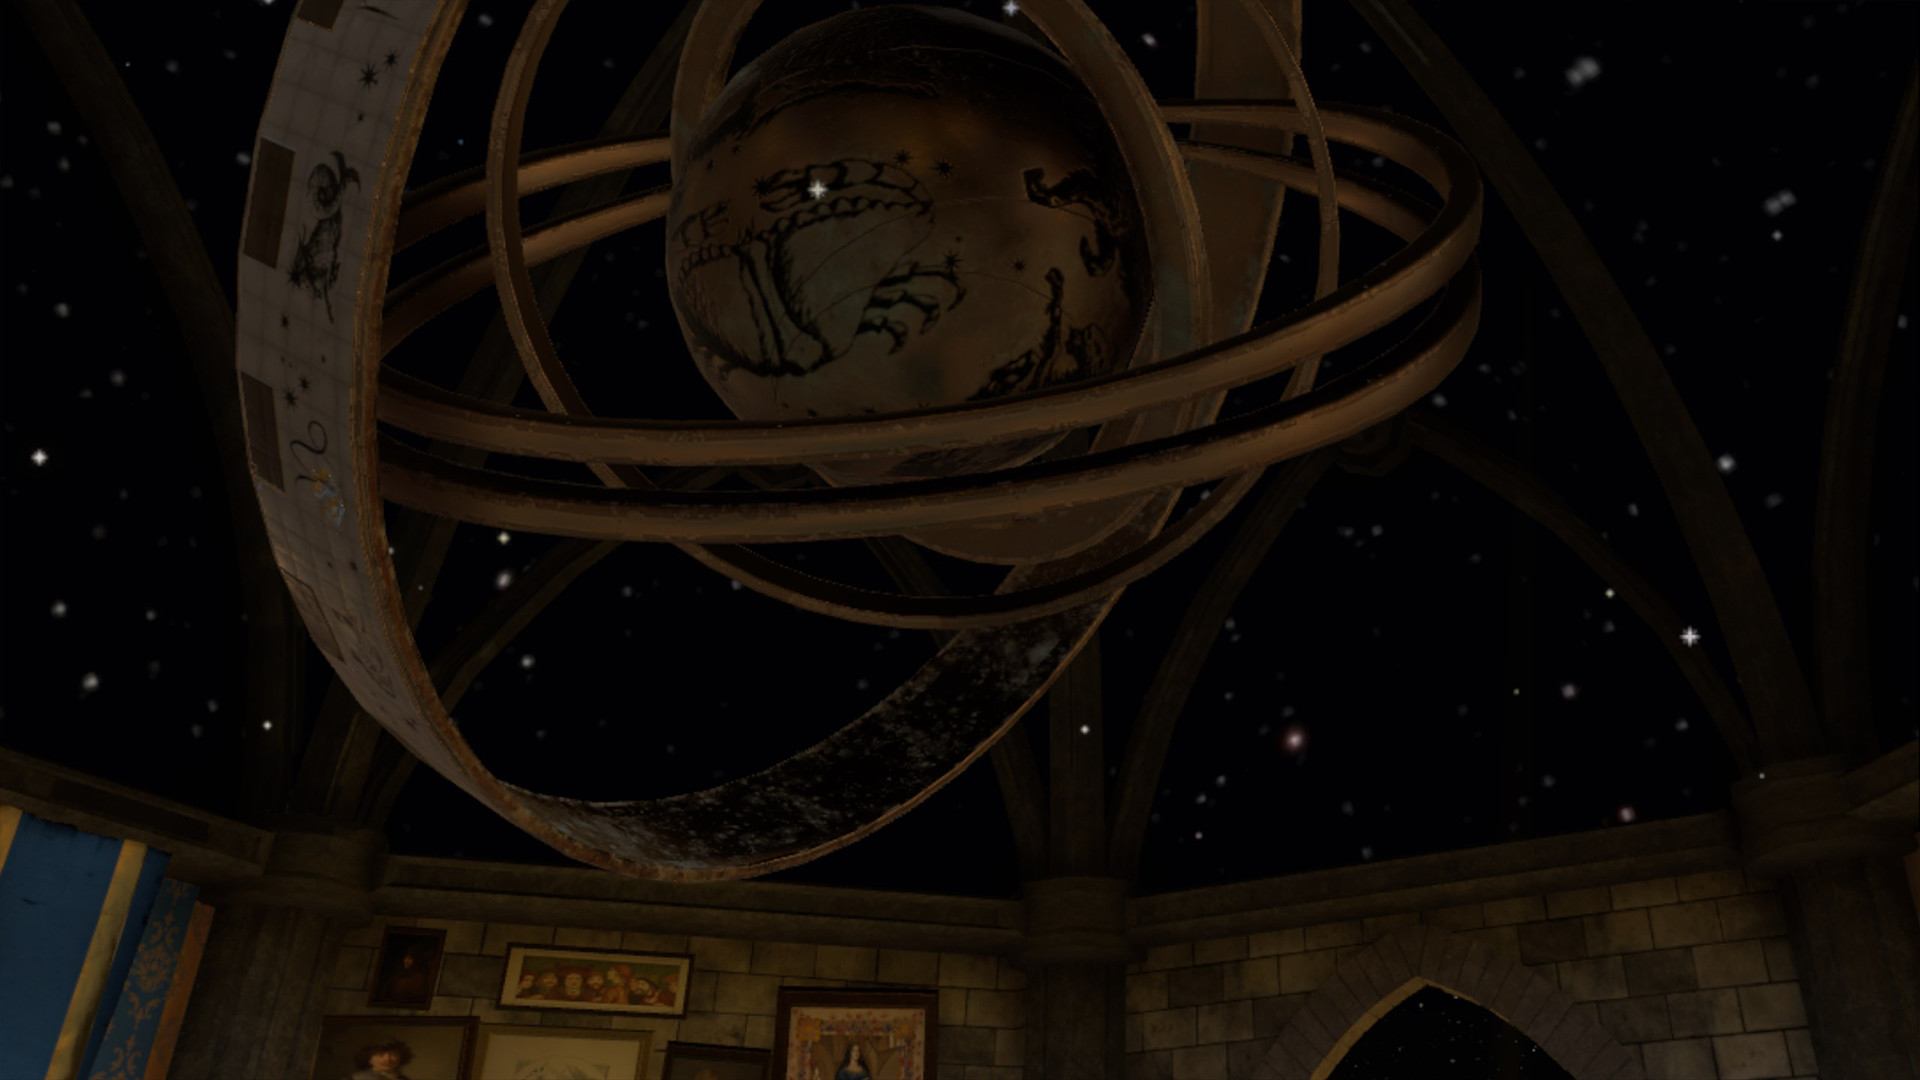 In-game screen capture - celestial globe